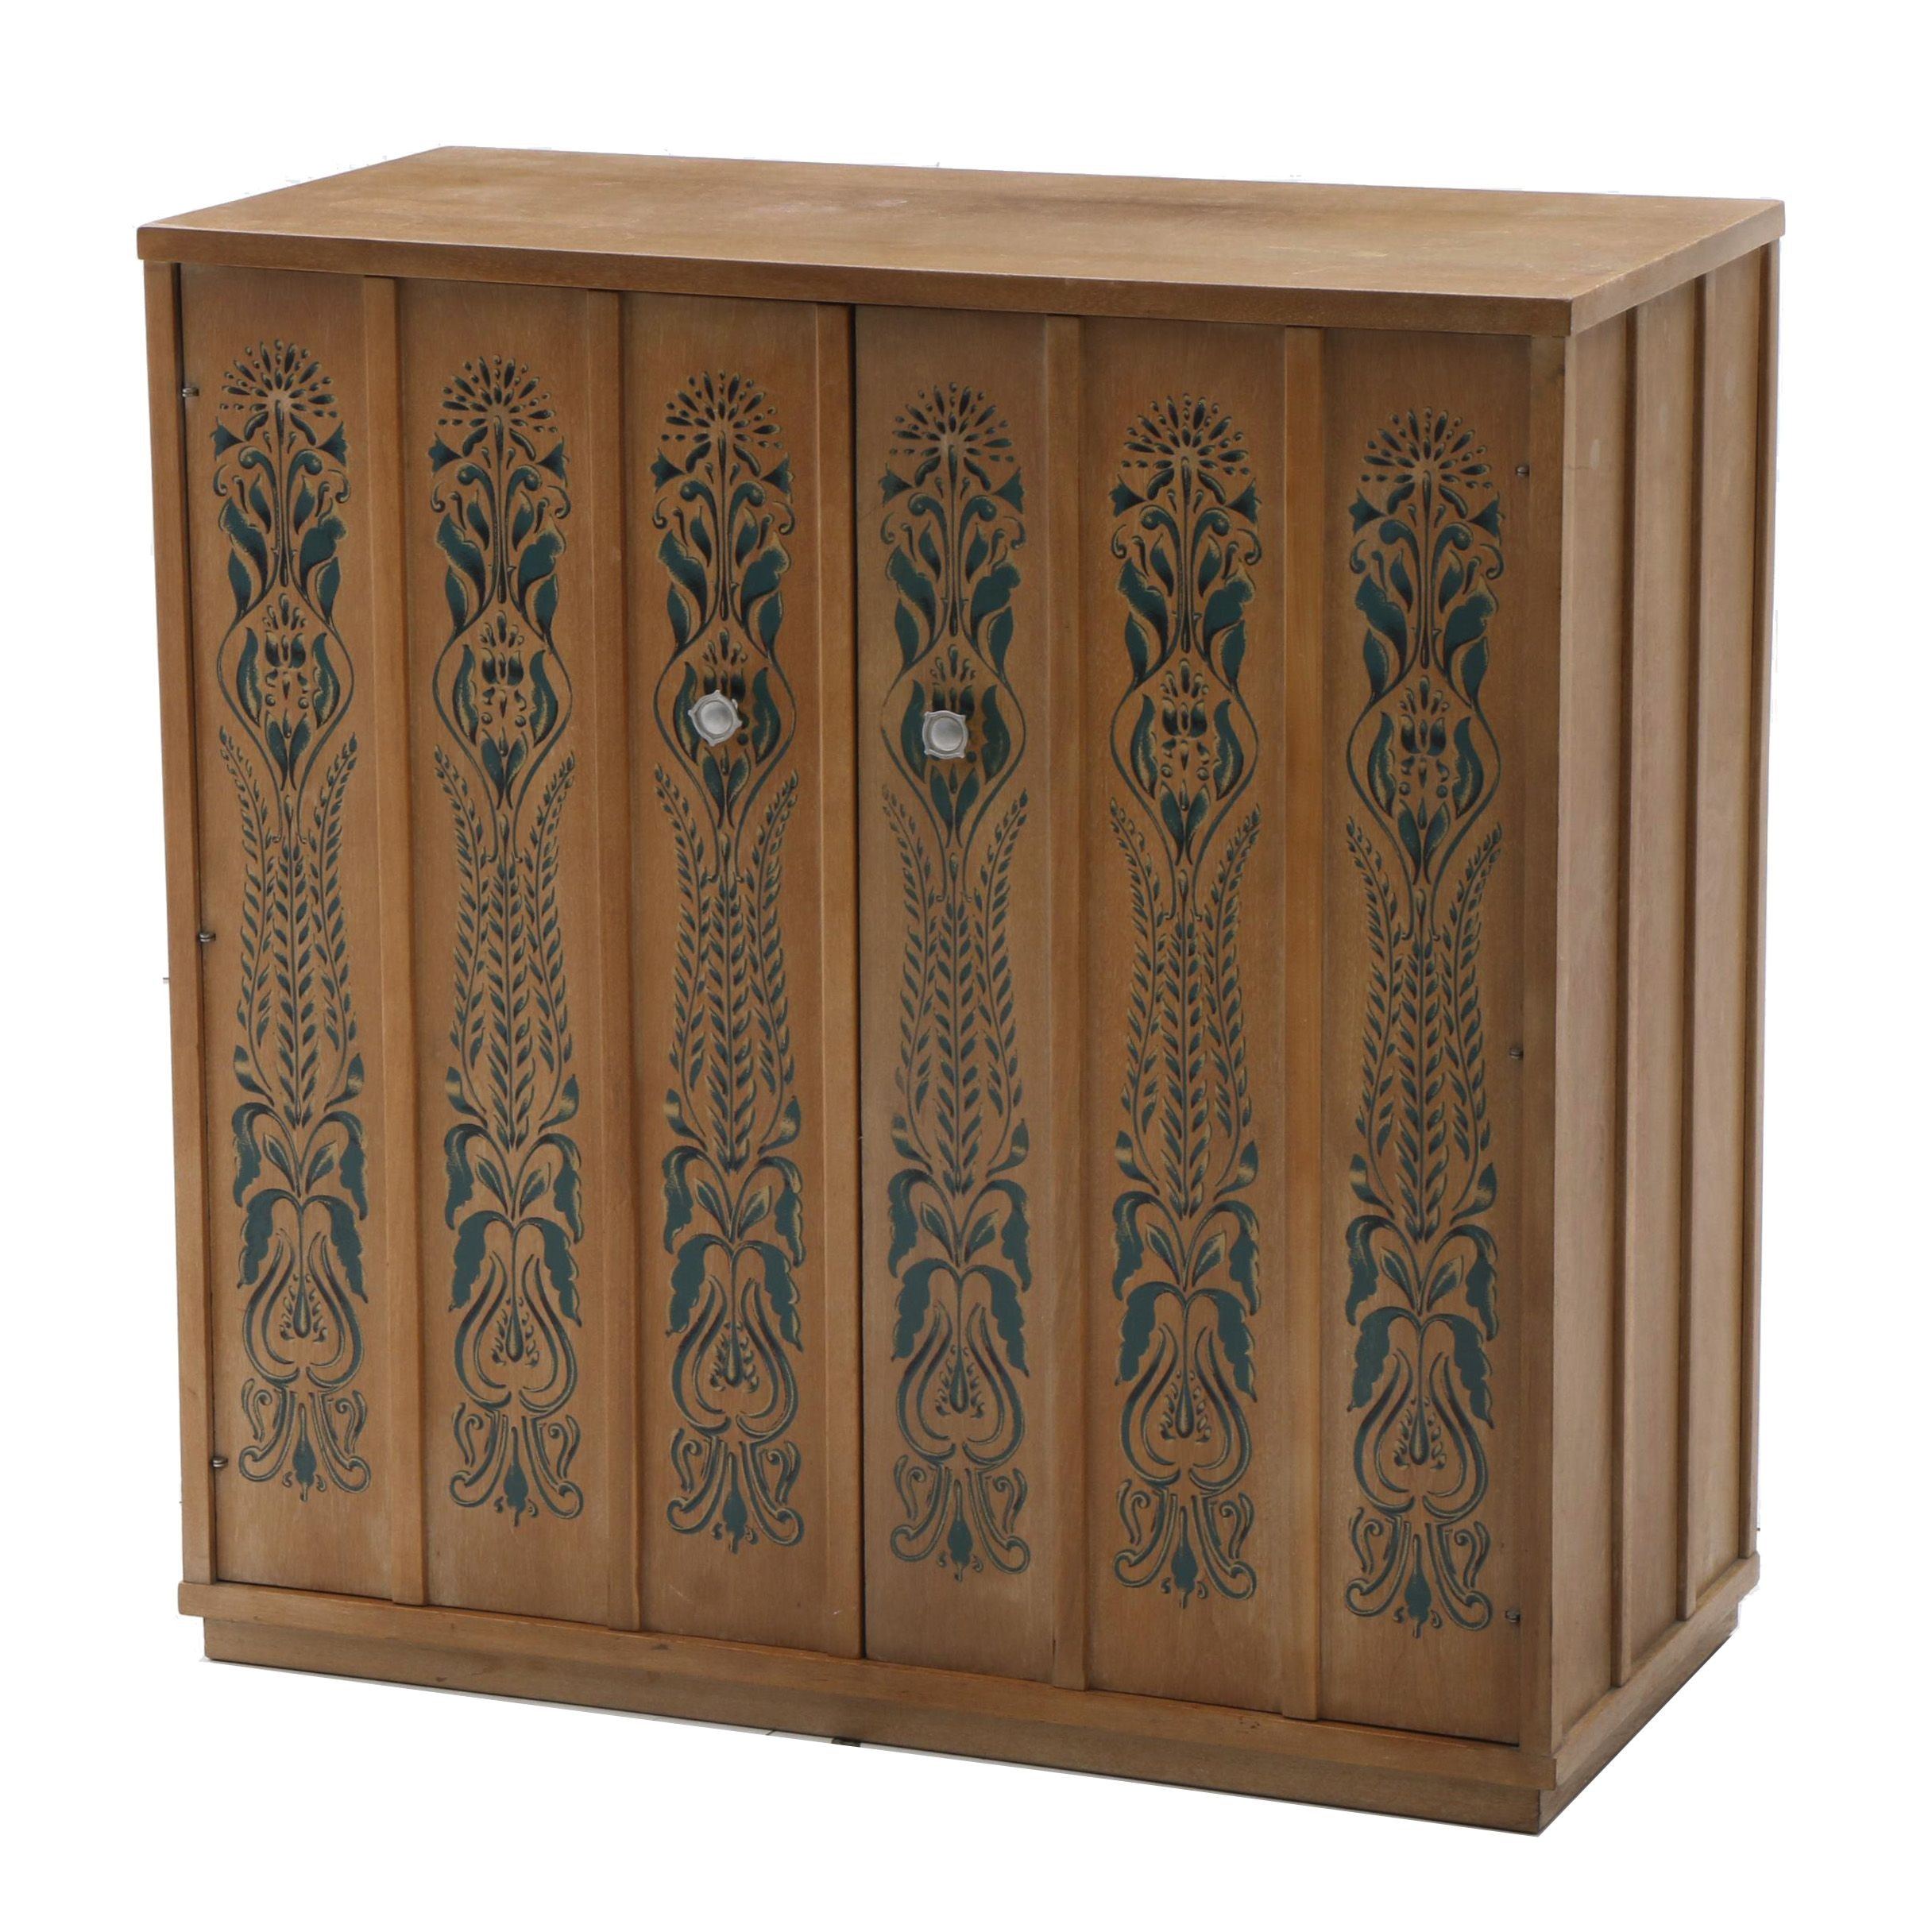 Drexel Stenciled Cabinet by John Van Koert